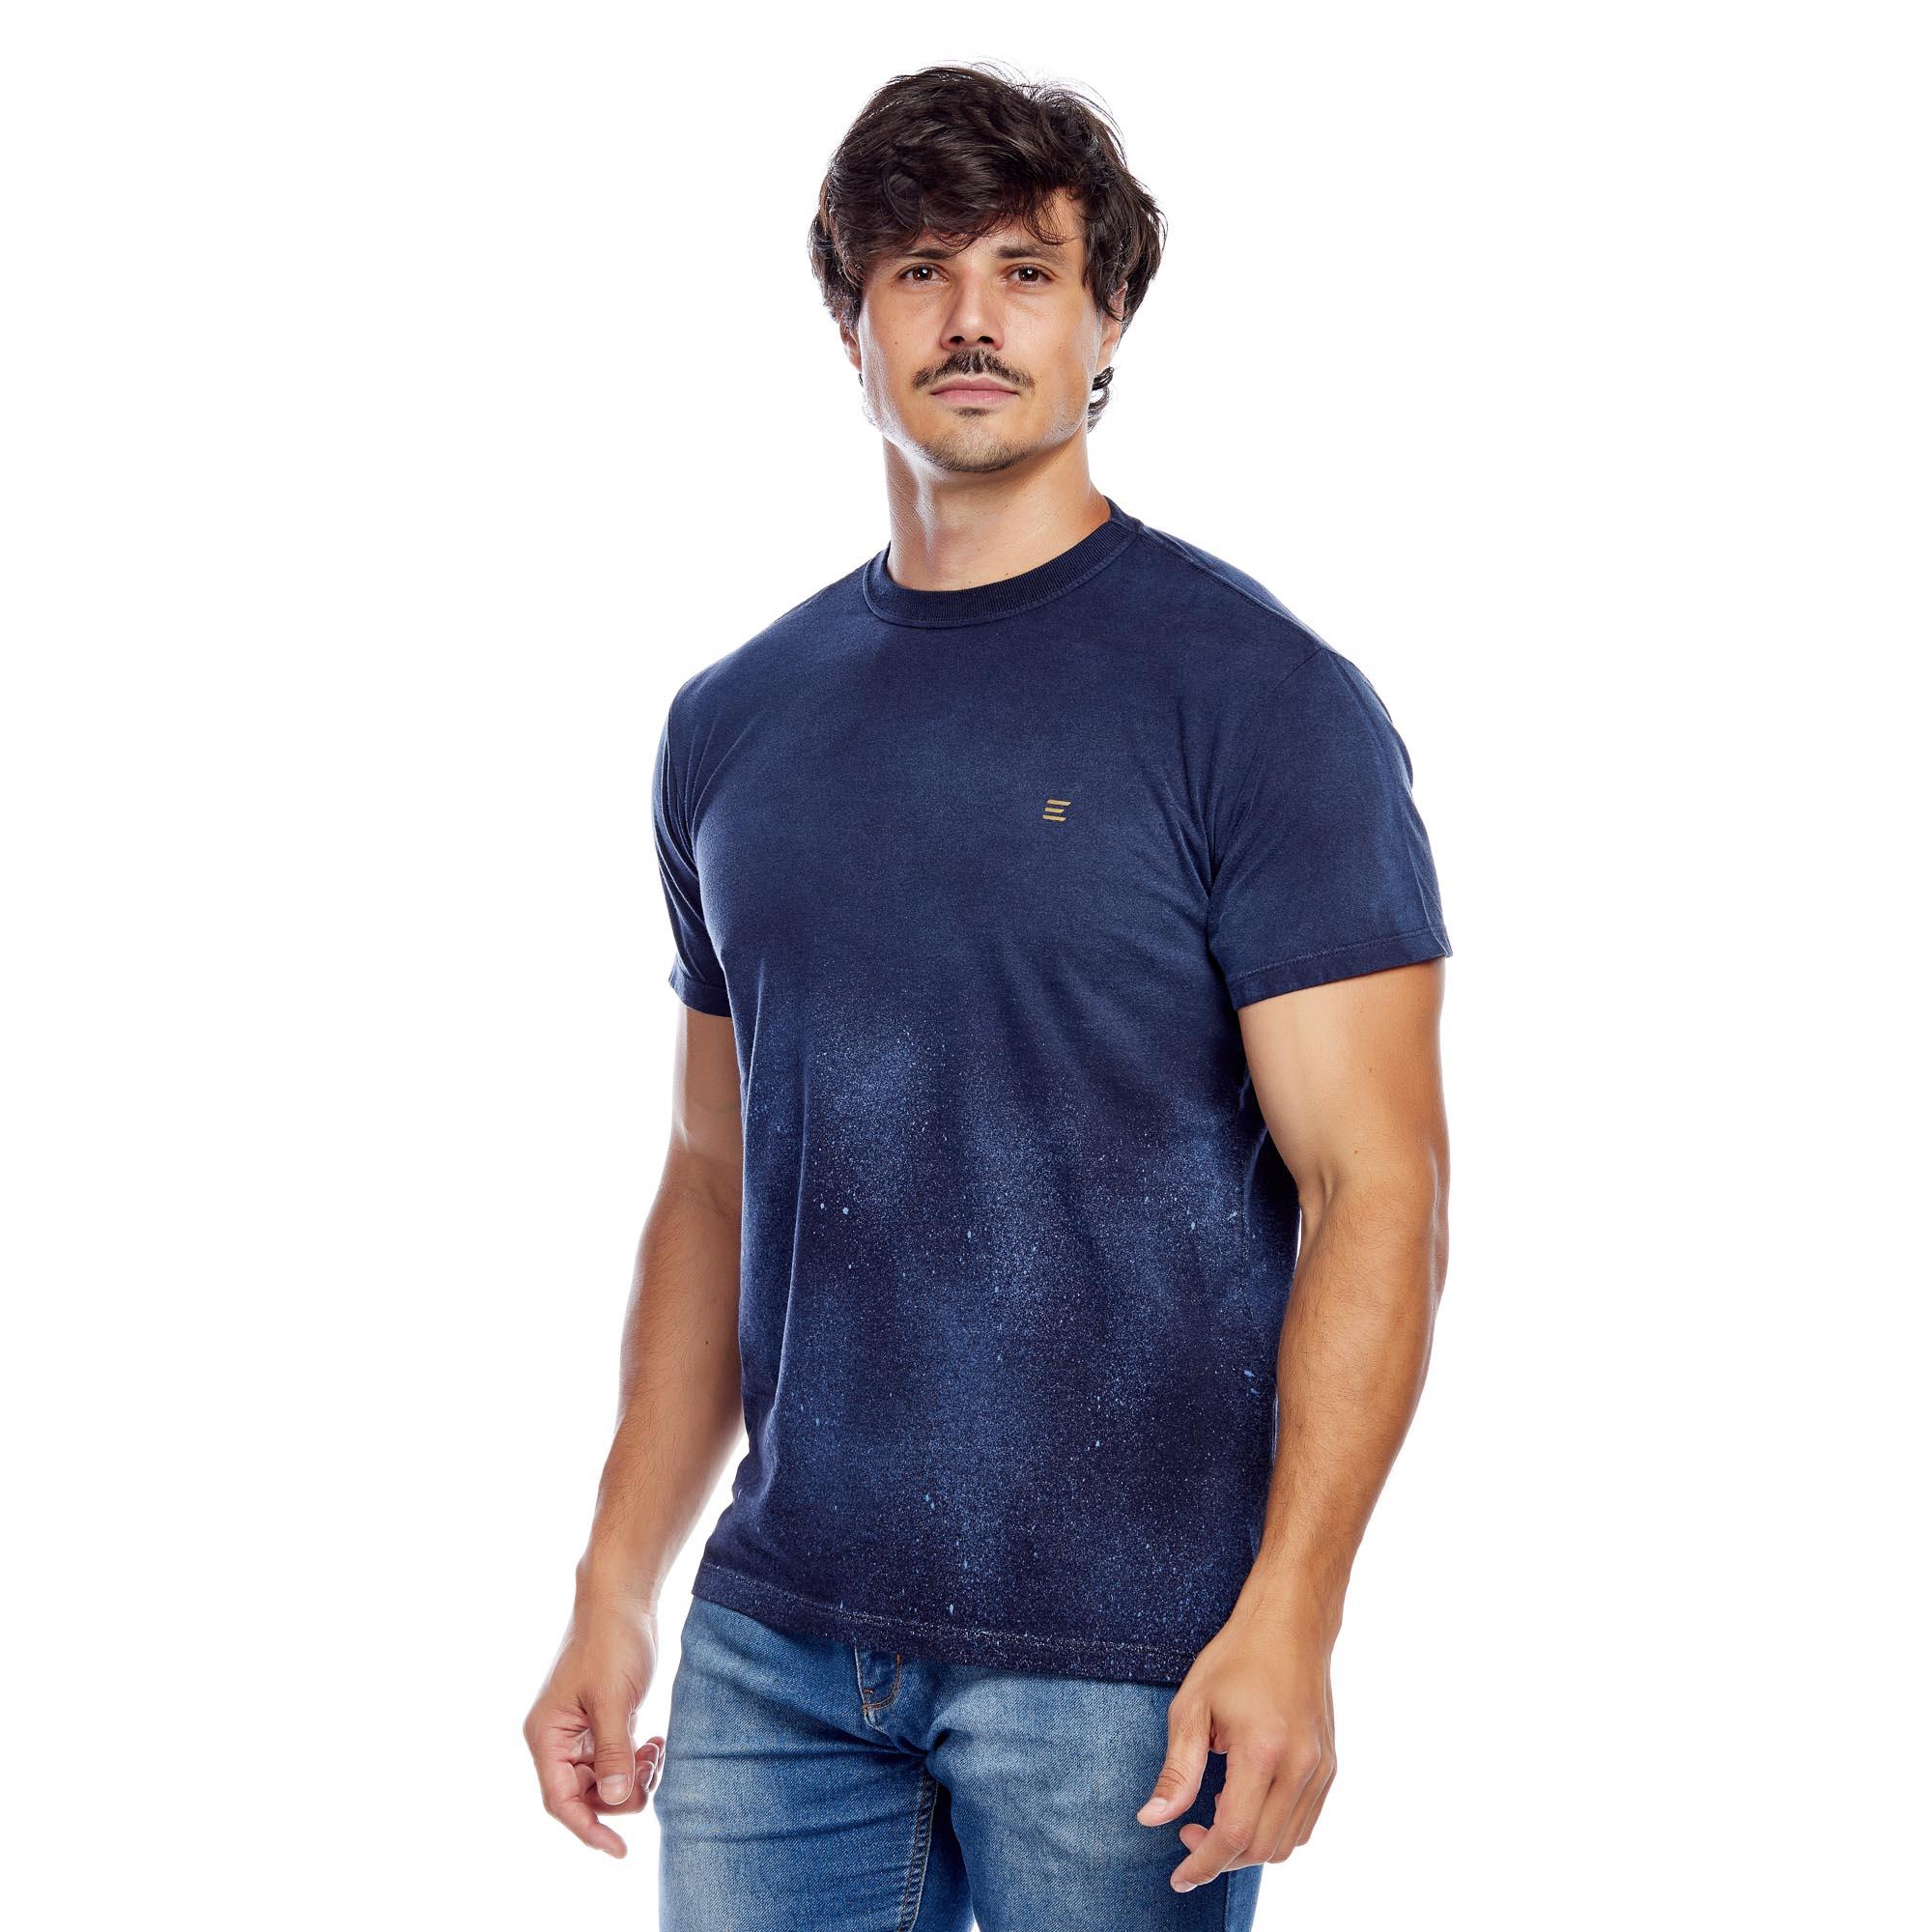 Camiseta Masculina Galaxy Evolvee